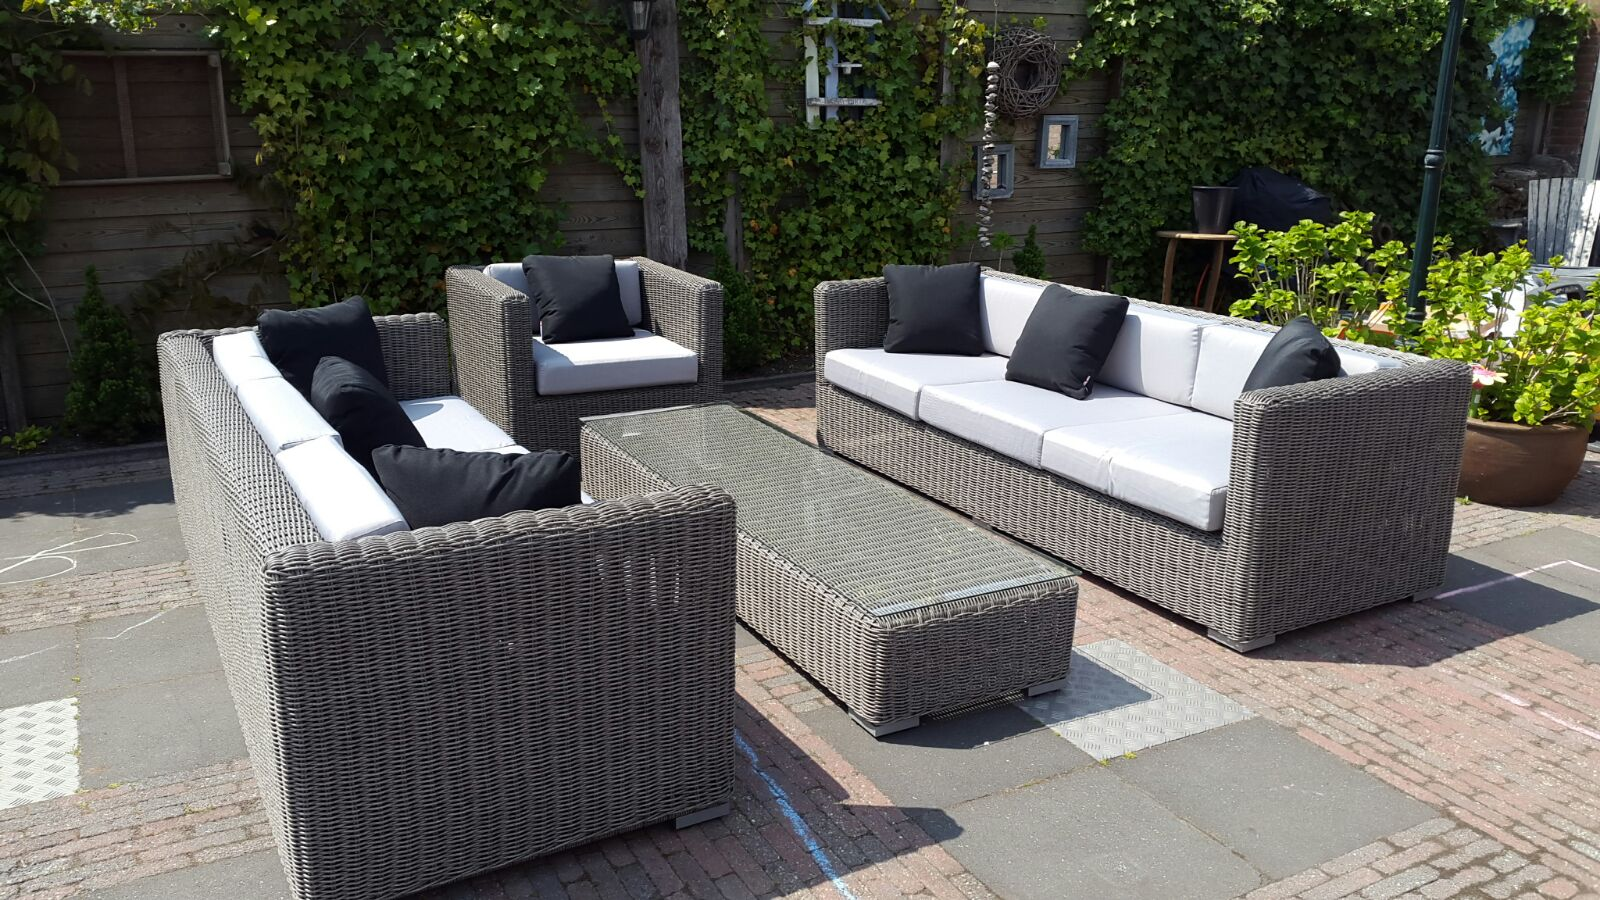 Lounge hoekbank wicker arbrini design tuinmeubelen arbrini wicker loungeset riet grijs - Sofa vlechtwerk ...